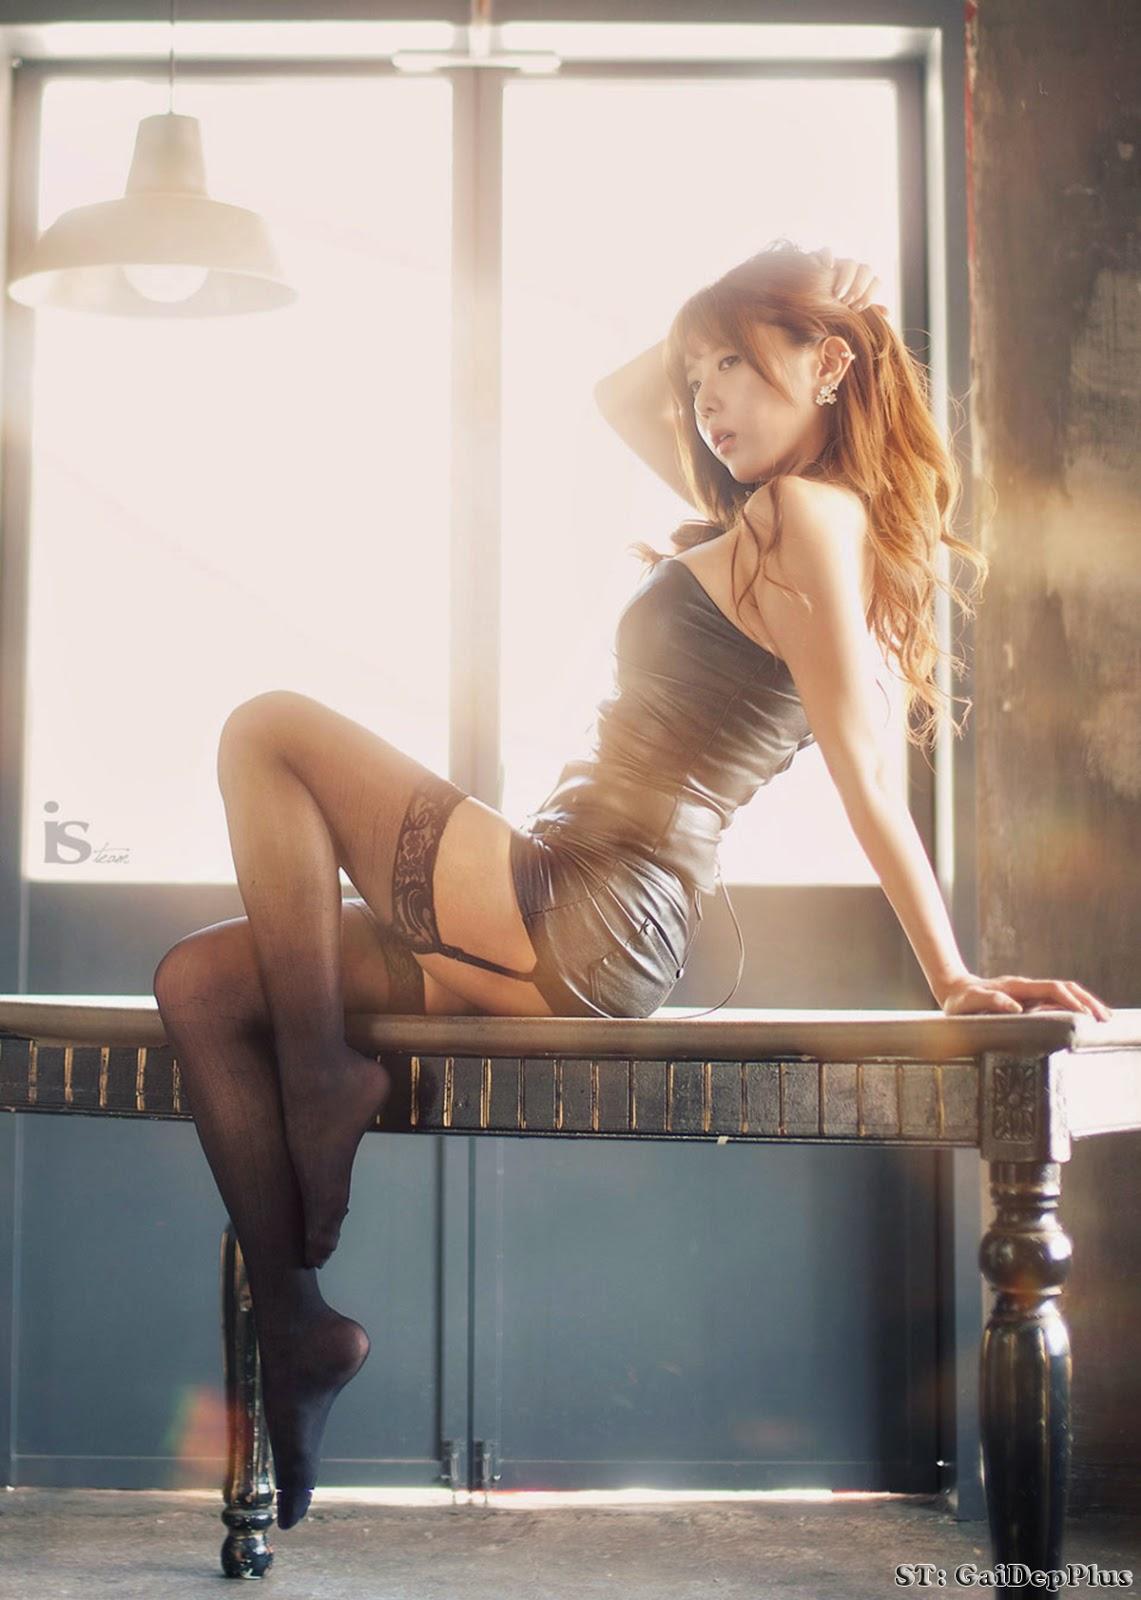 Heo Yunmi Queen Of Korean Cars Sexy Side Sofa  Beautiful Girl-6166